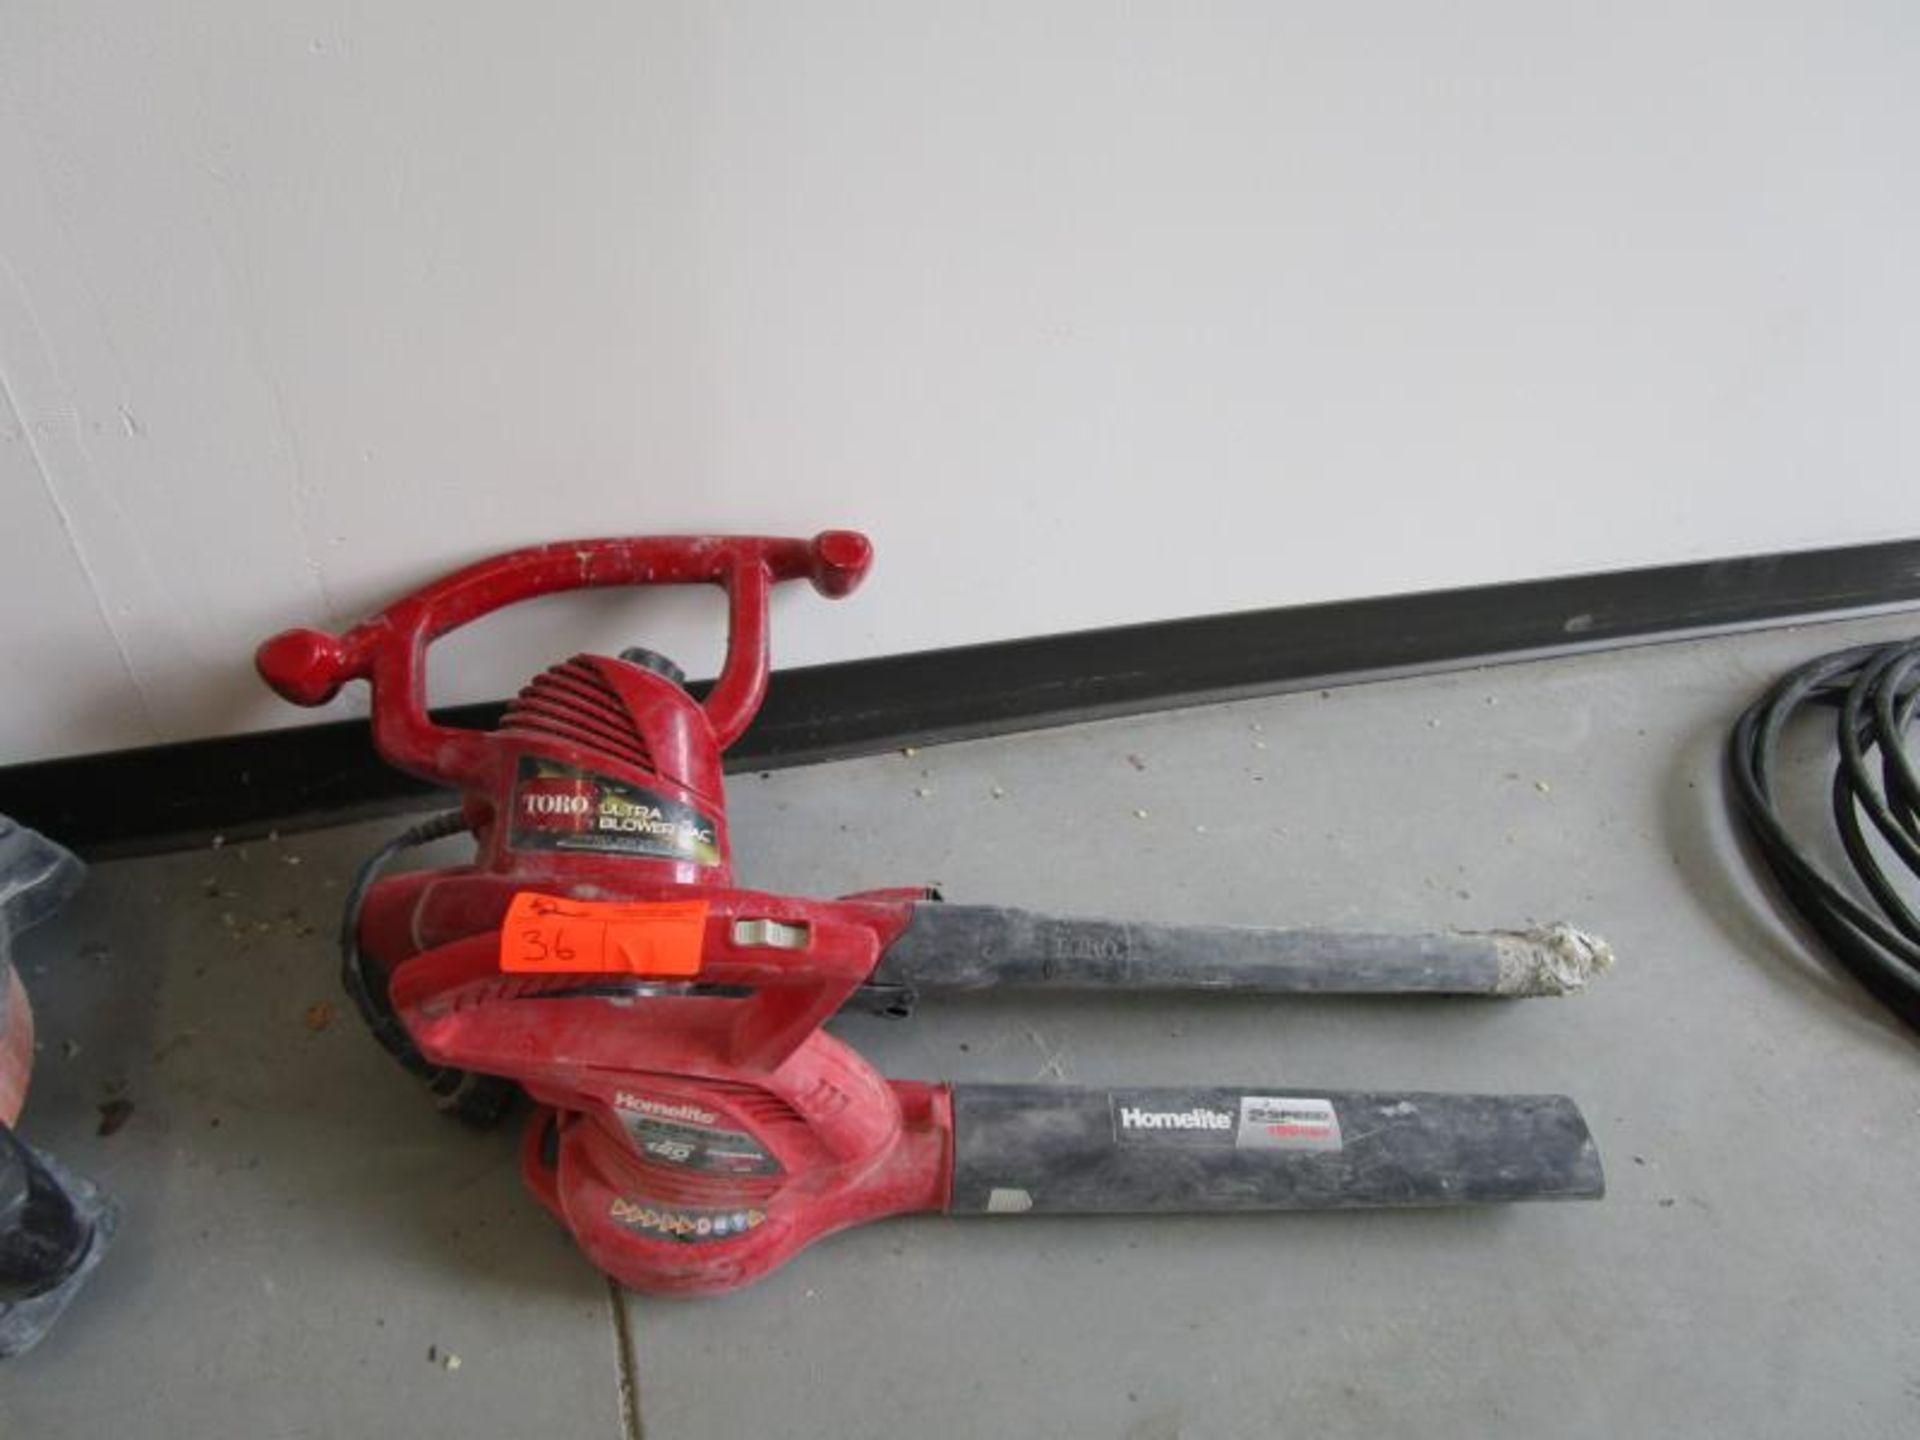 Lot 36 - 2 Electric Leaf Blowers, (1) Homelite, (1) Toro